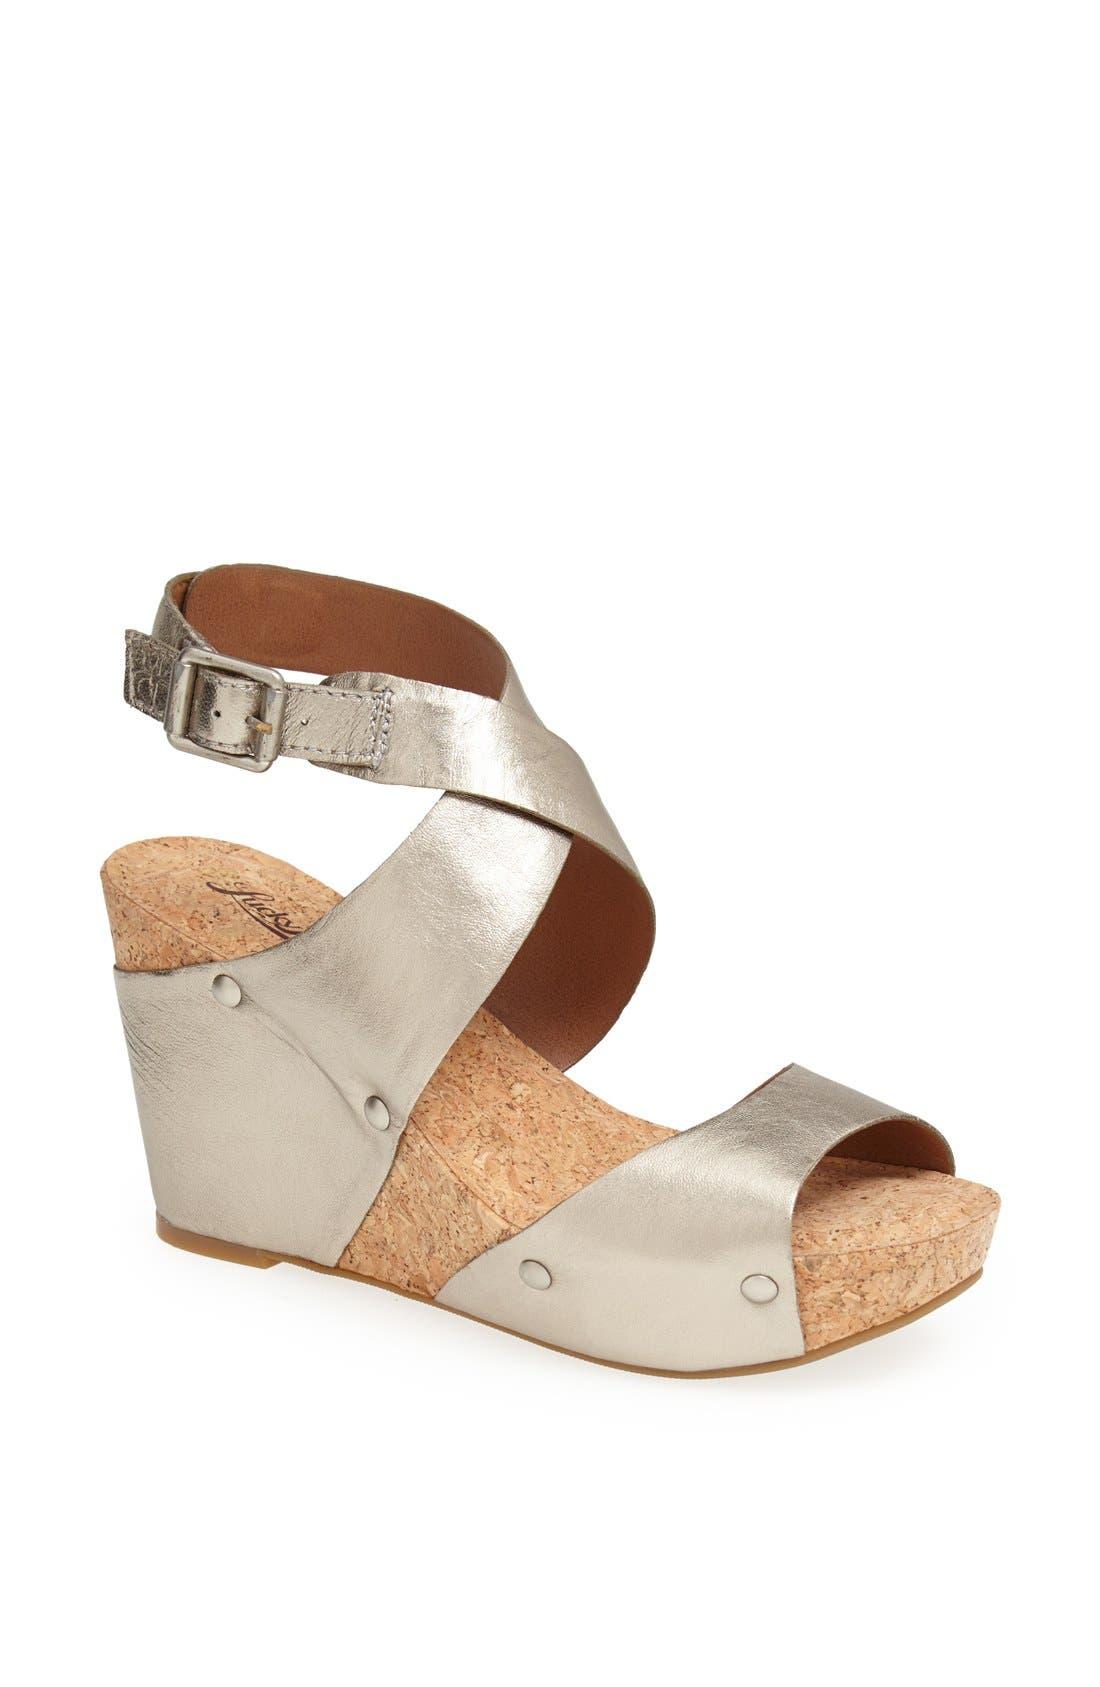 Main Image - Lucky Brand 'Moran' Sandal